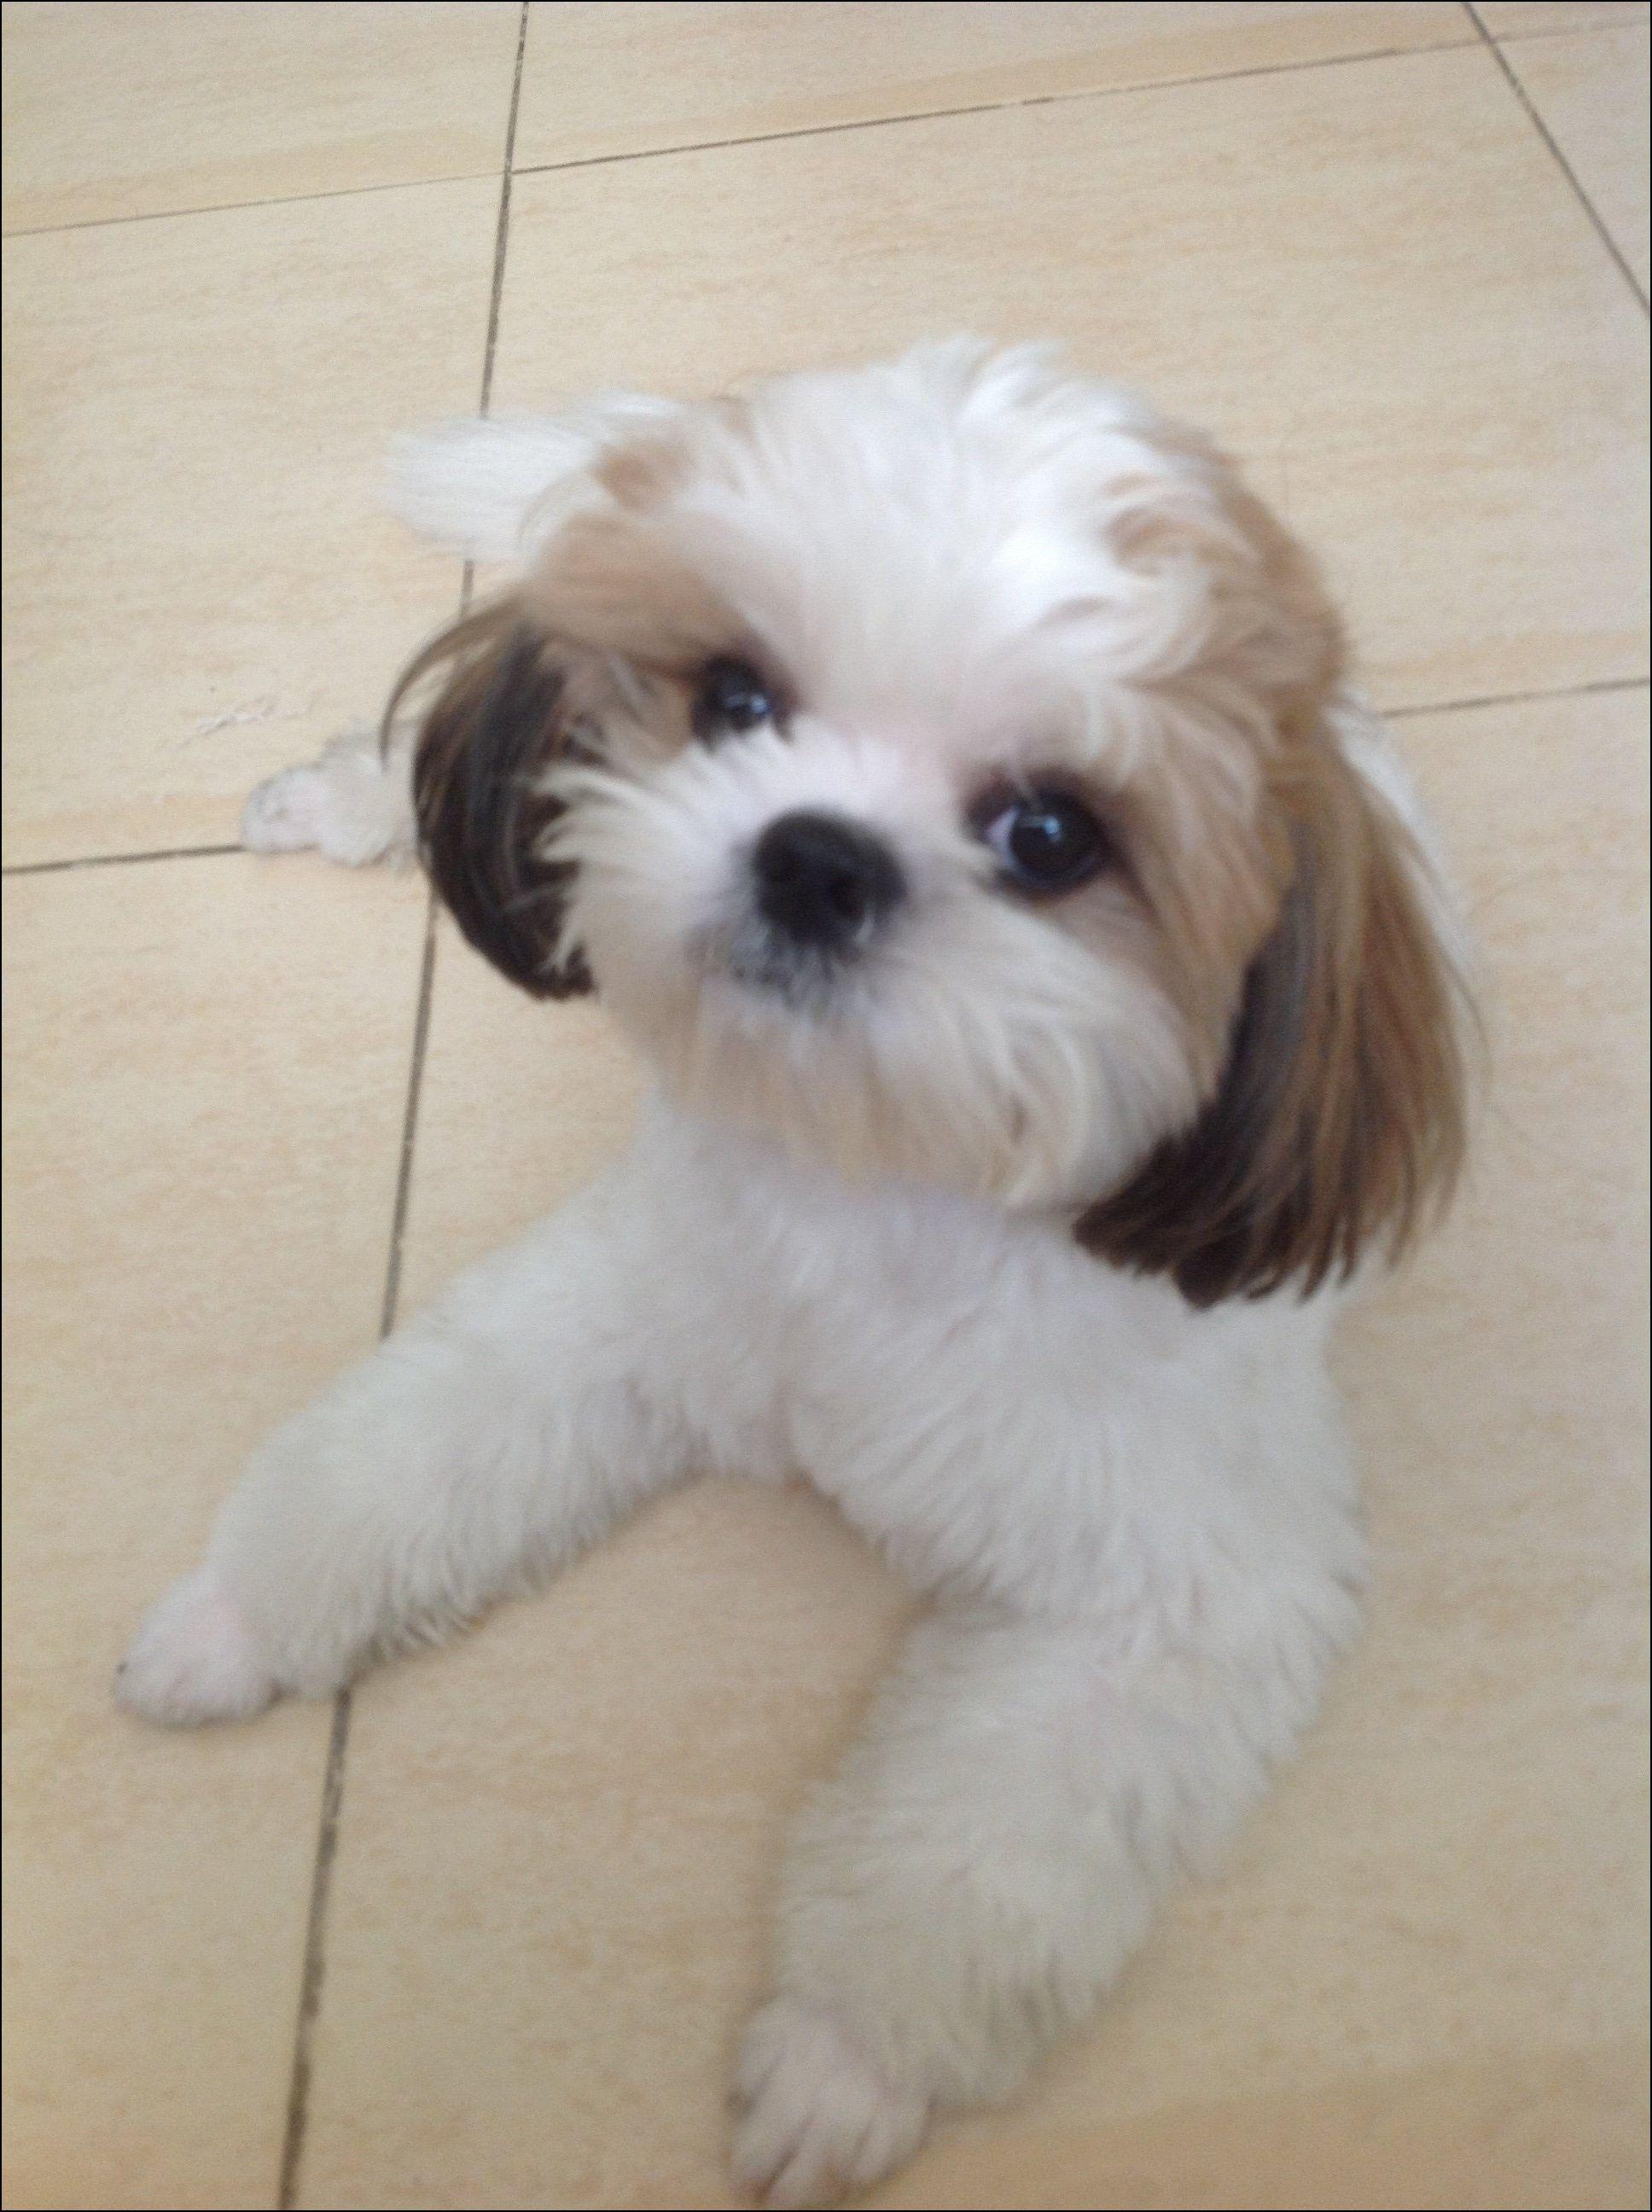 Shih Tzu Puppies Haircuts Hairstyles Ideas Pinterest Shih Tzu